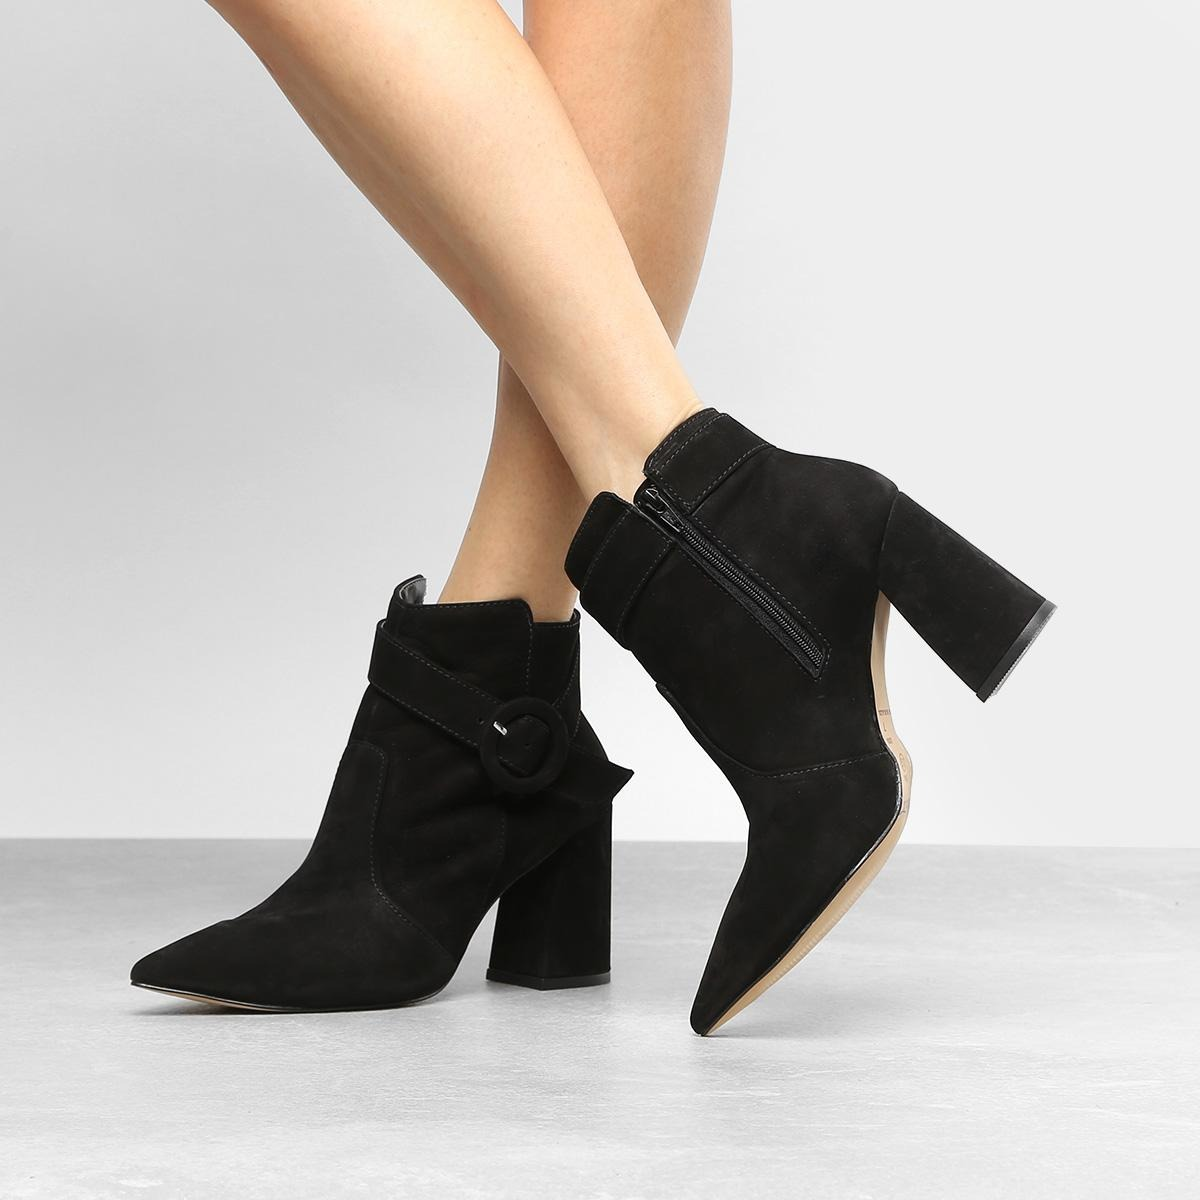 61a3dac85 bota couro cano curto shoestock fivela redonda feminina. Carregando zoom.